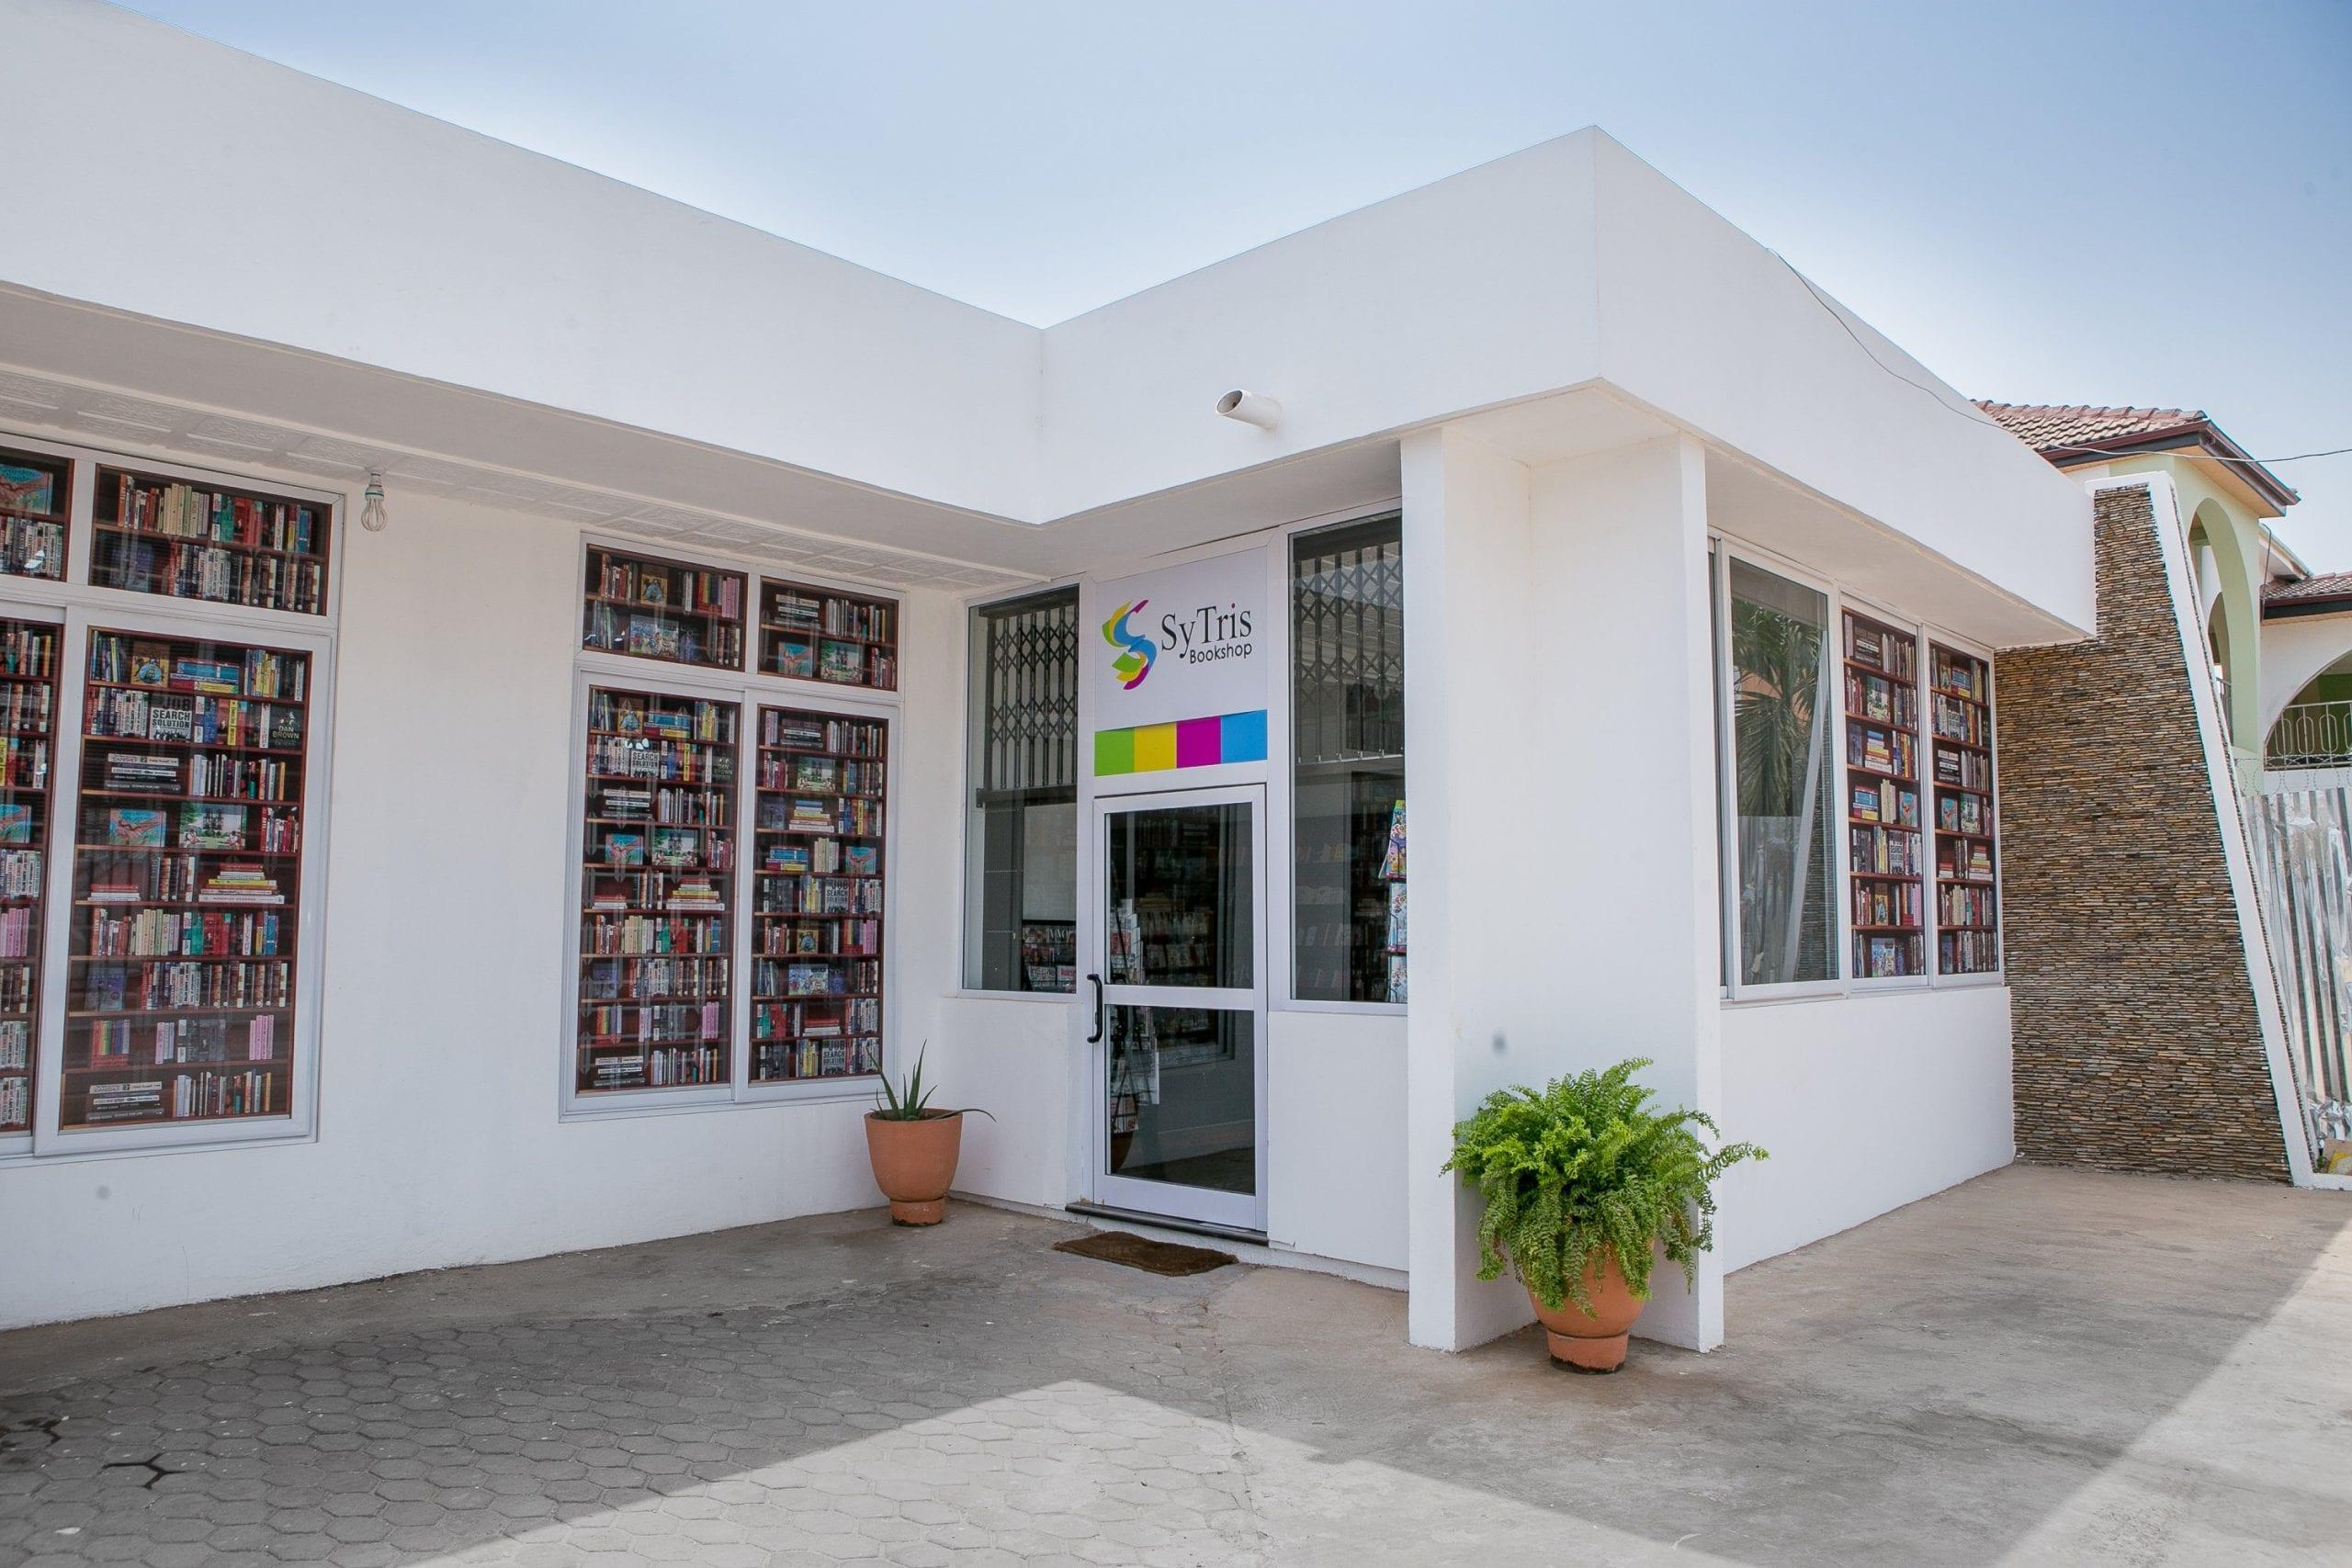 SyTris Bookshop best bookshops in Accra Ghana